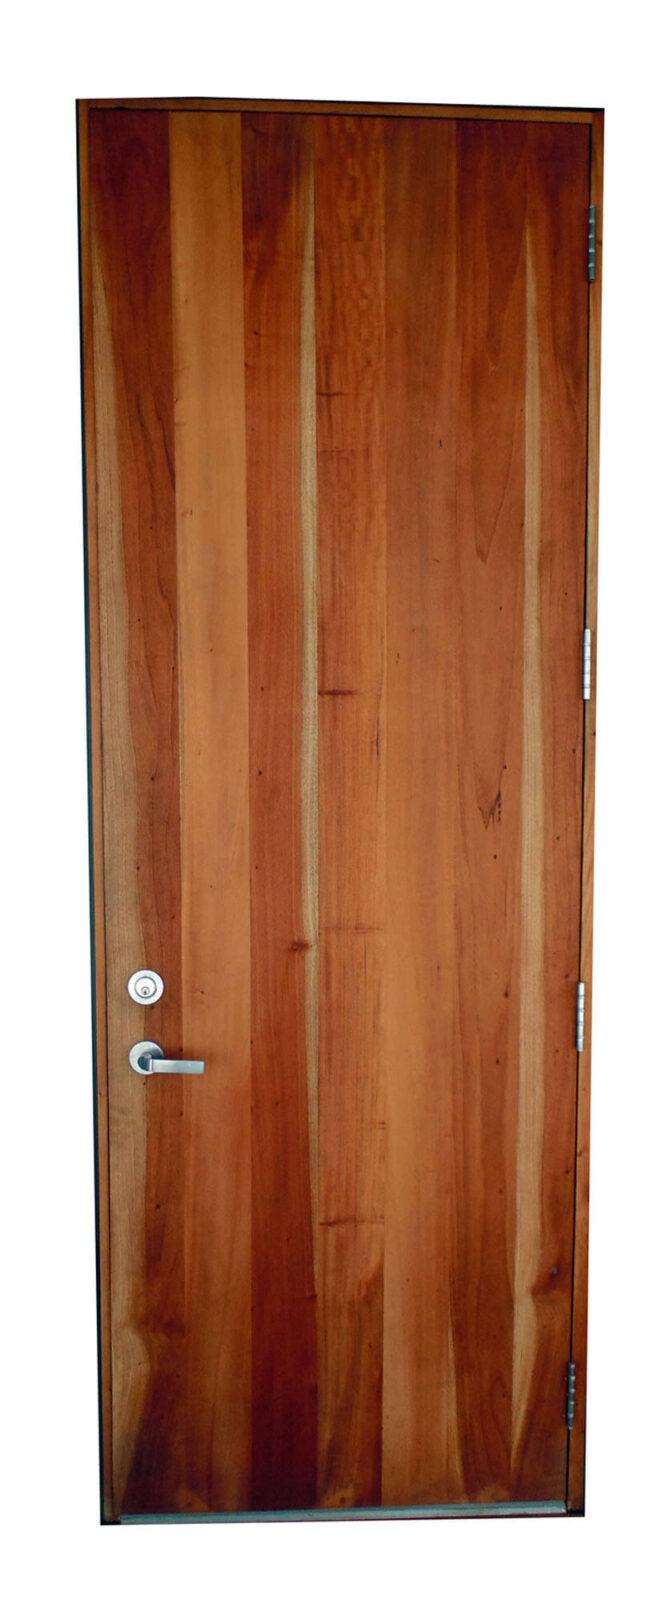 BISCAYNE POINT. MAHOGANY PLANK DOOR.